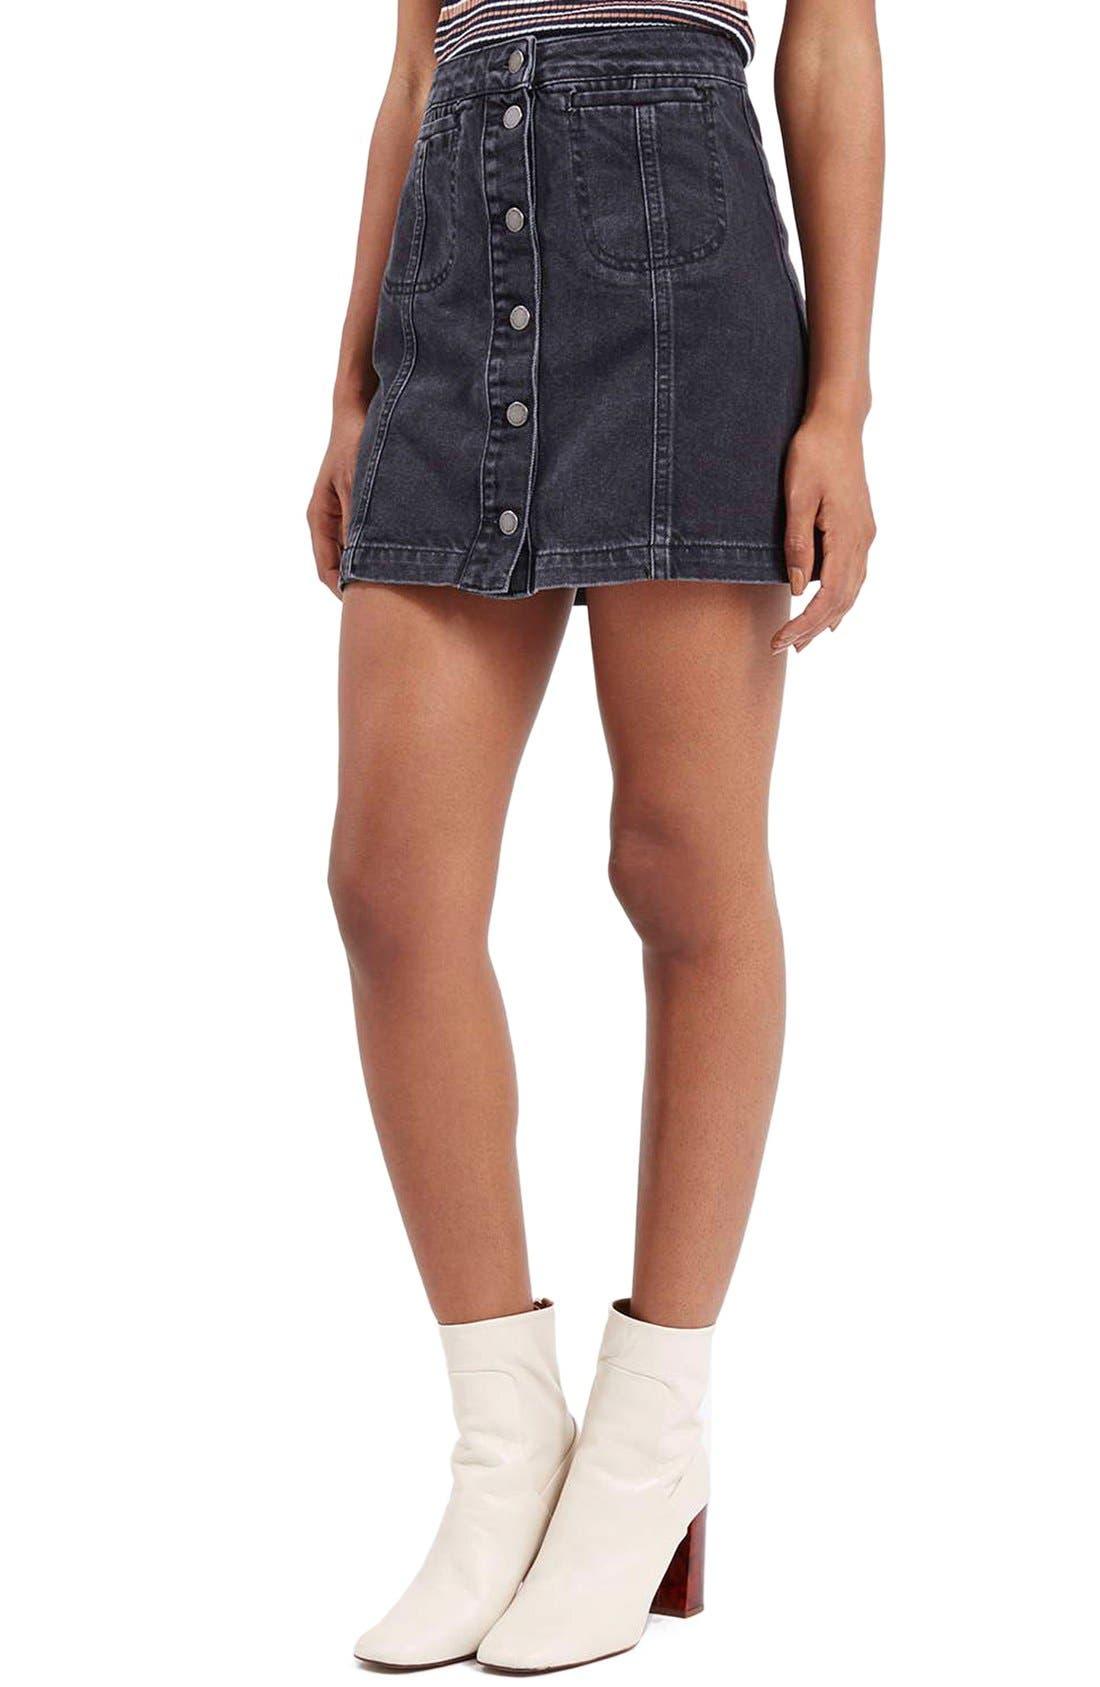 Alternate Image 1 Selected - Topshop Button Front Denim A-Line Skirt